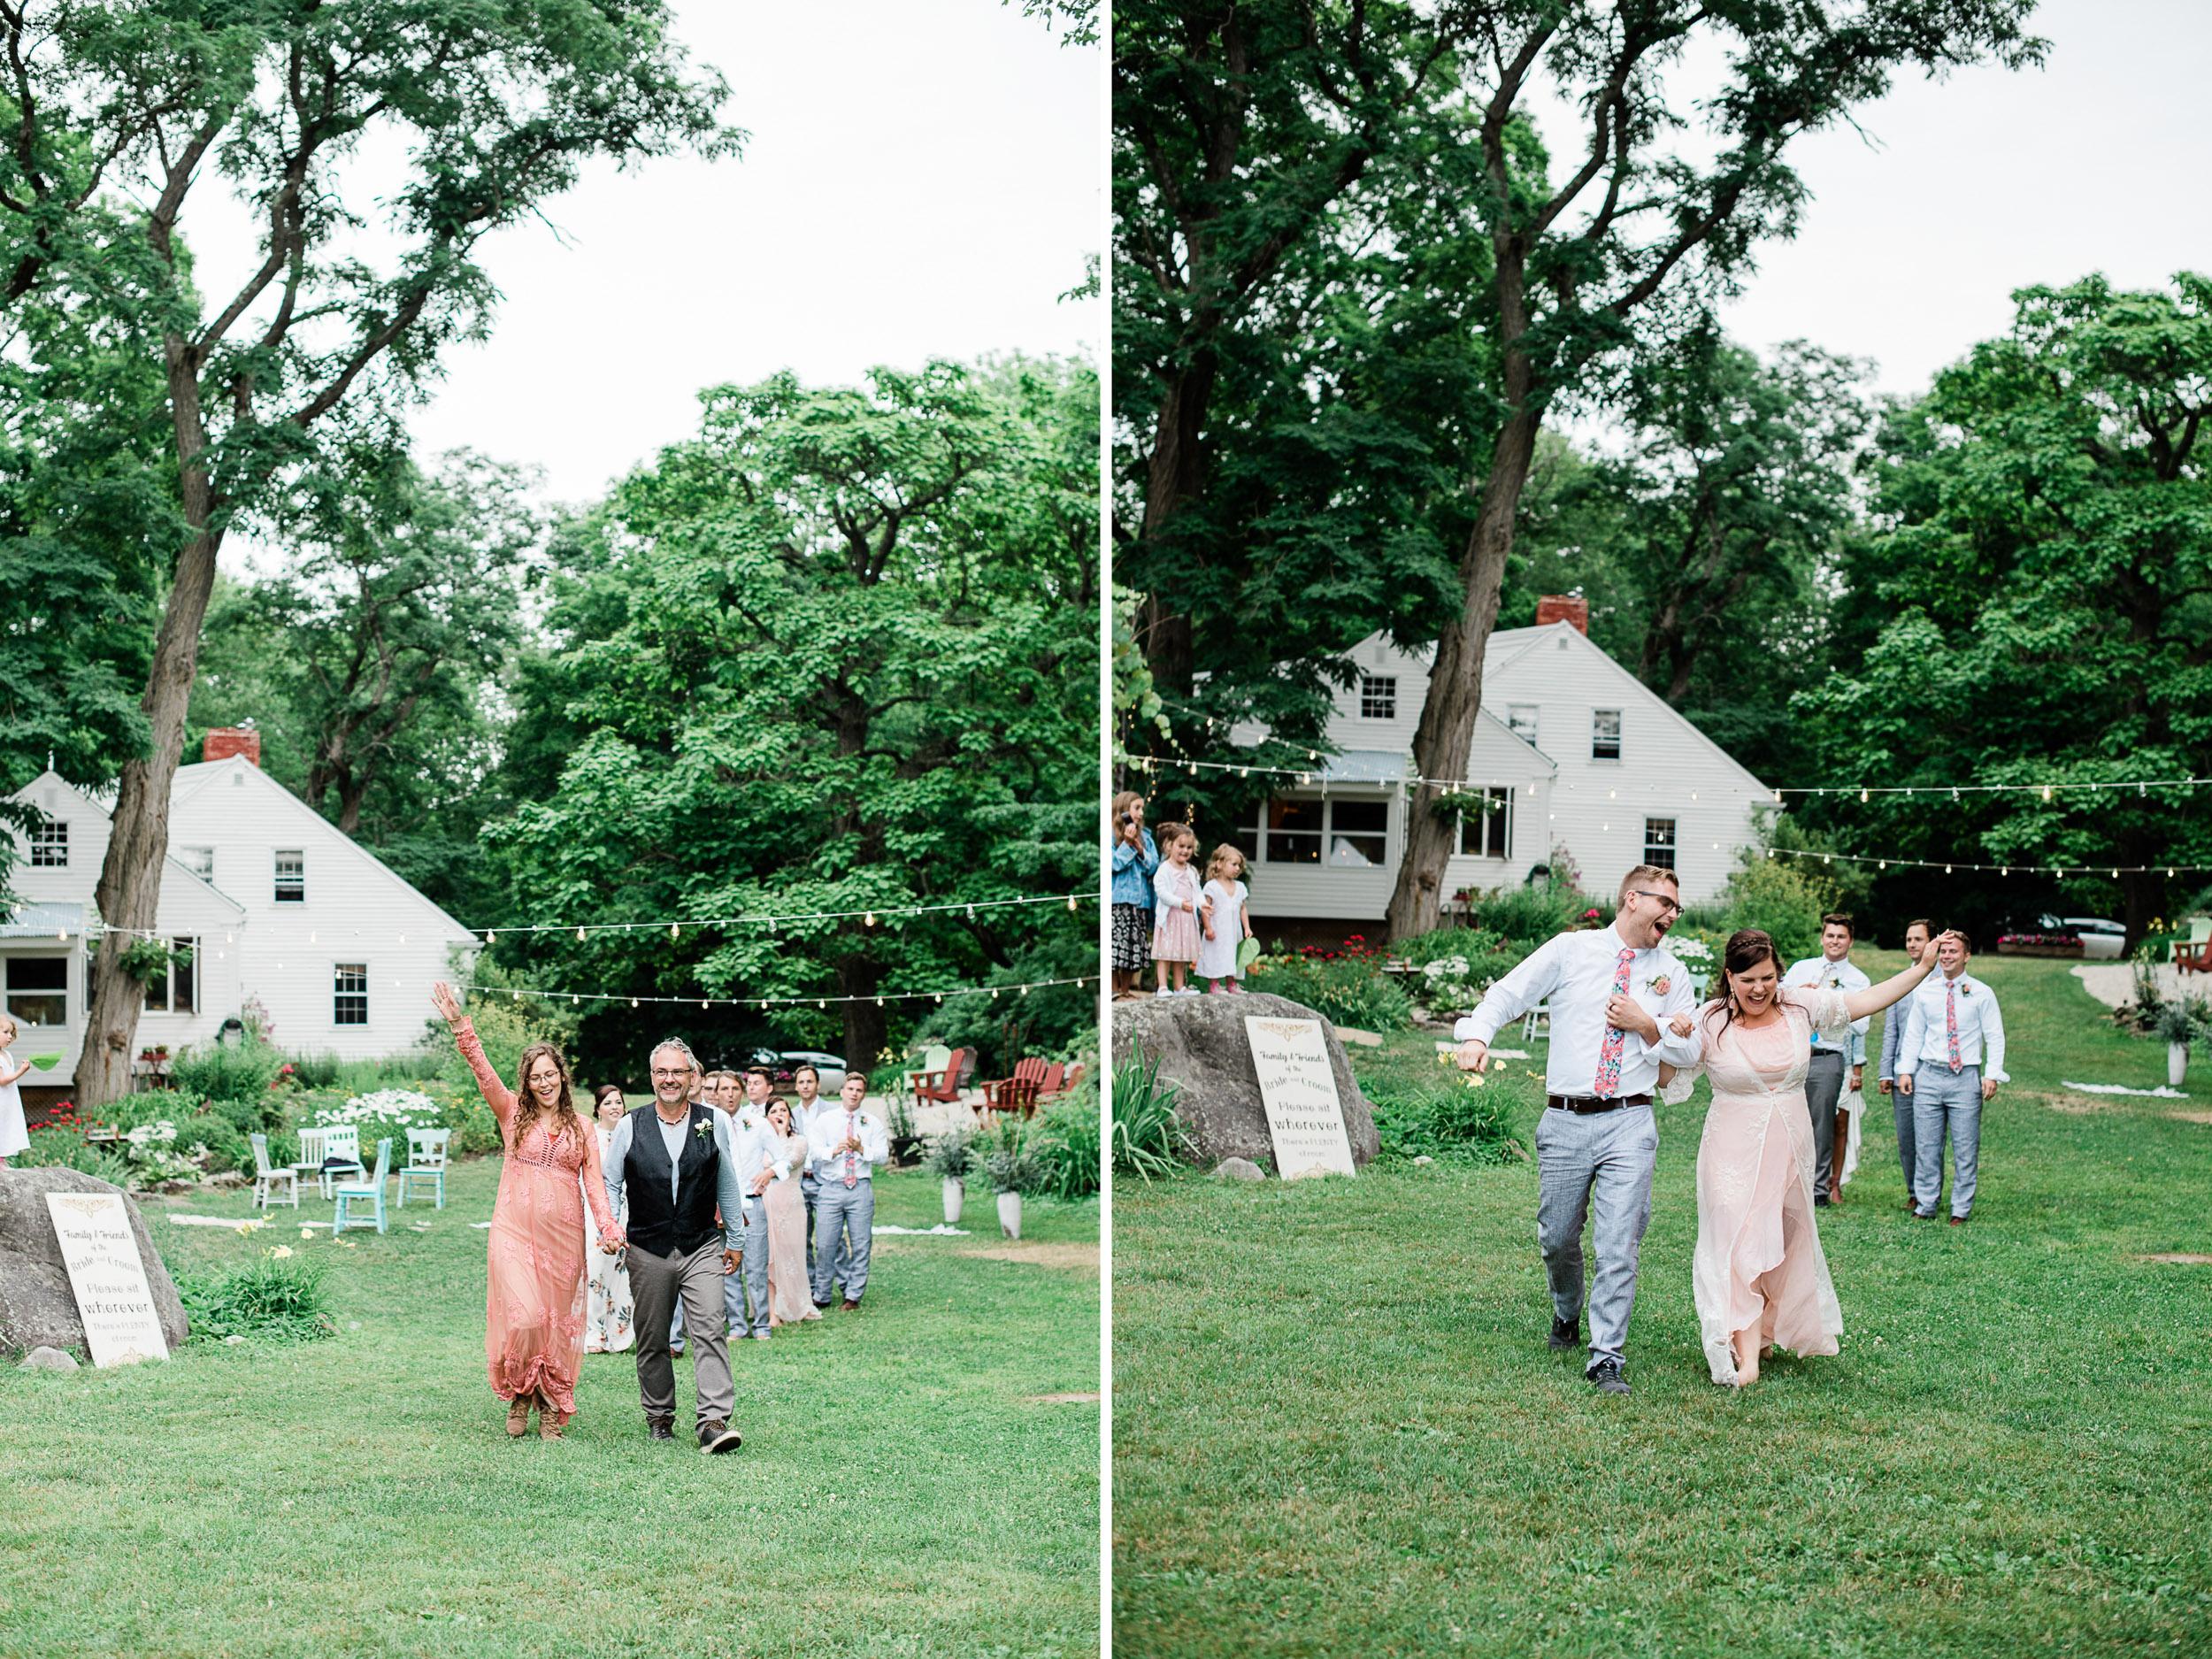 Wedding photographer in Great Barrington